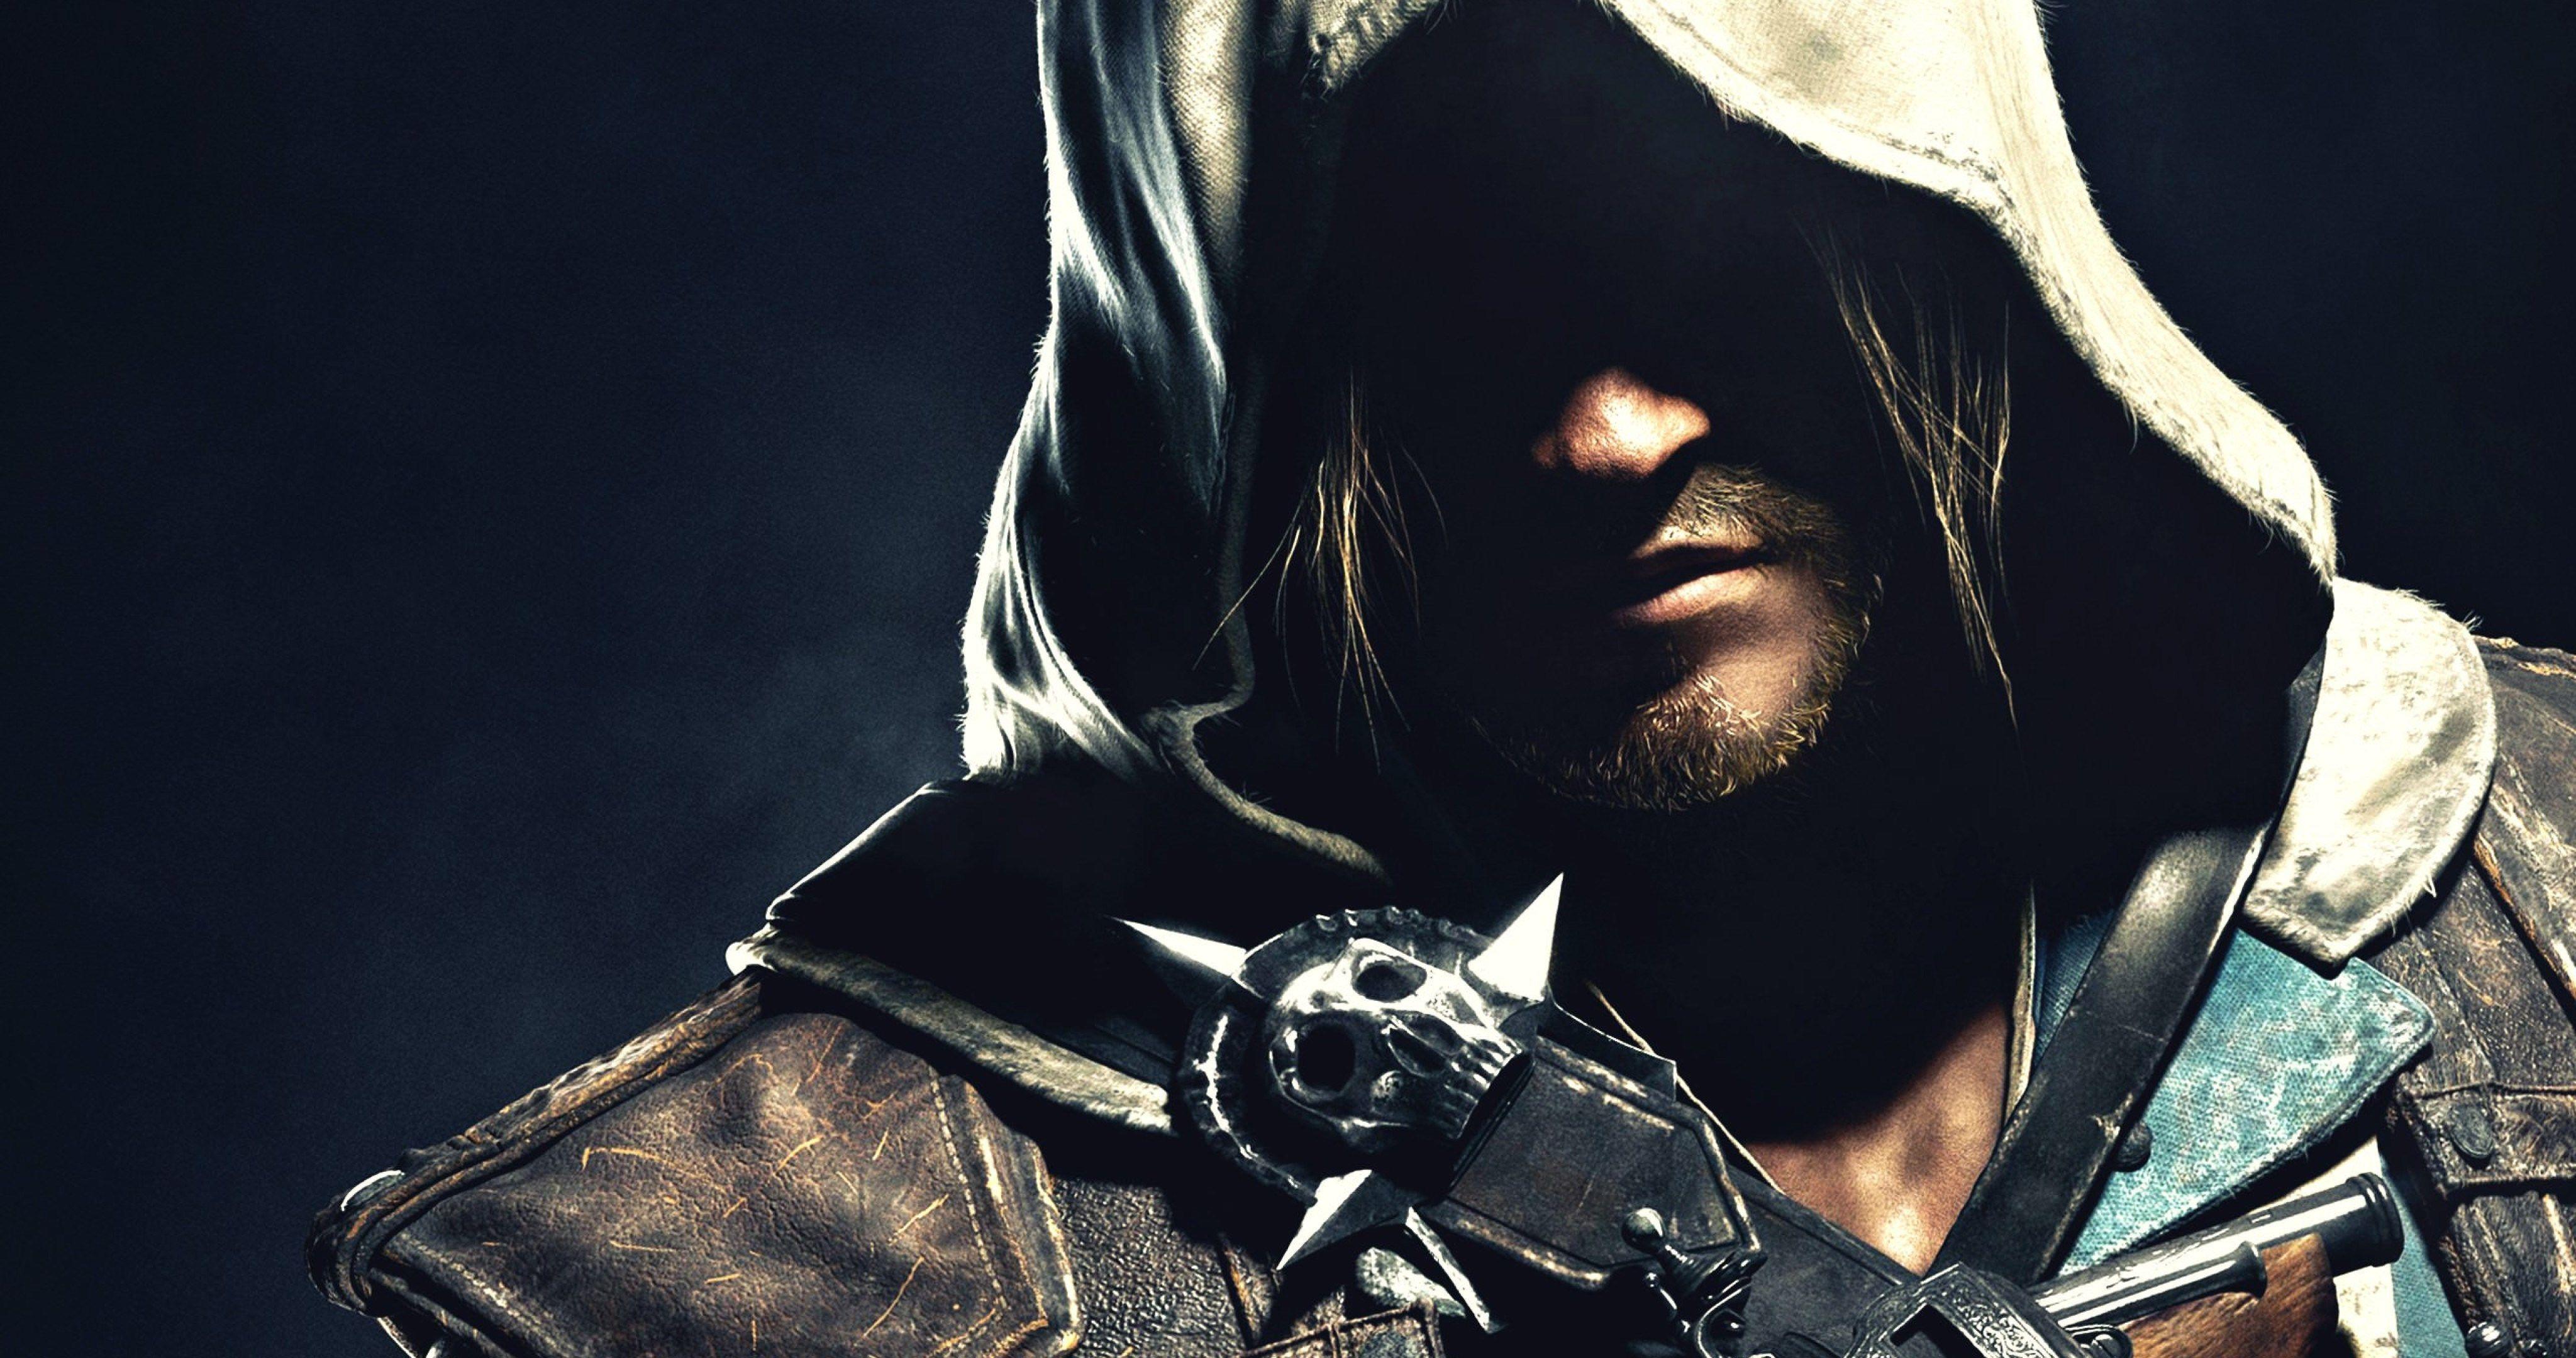 Assassins Creed Iv Black Flag Video Game 4k Ultra Hd Wallpaper